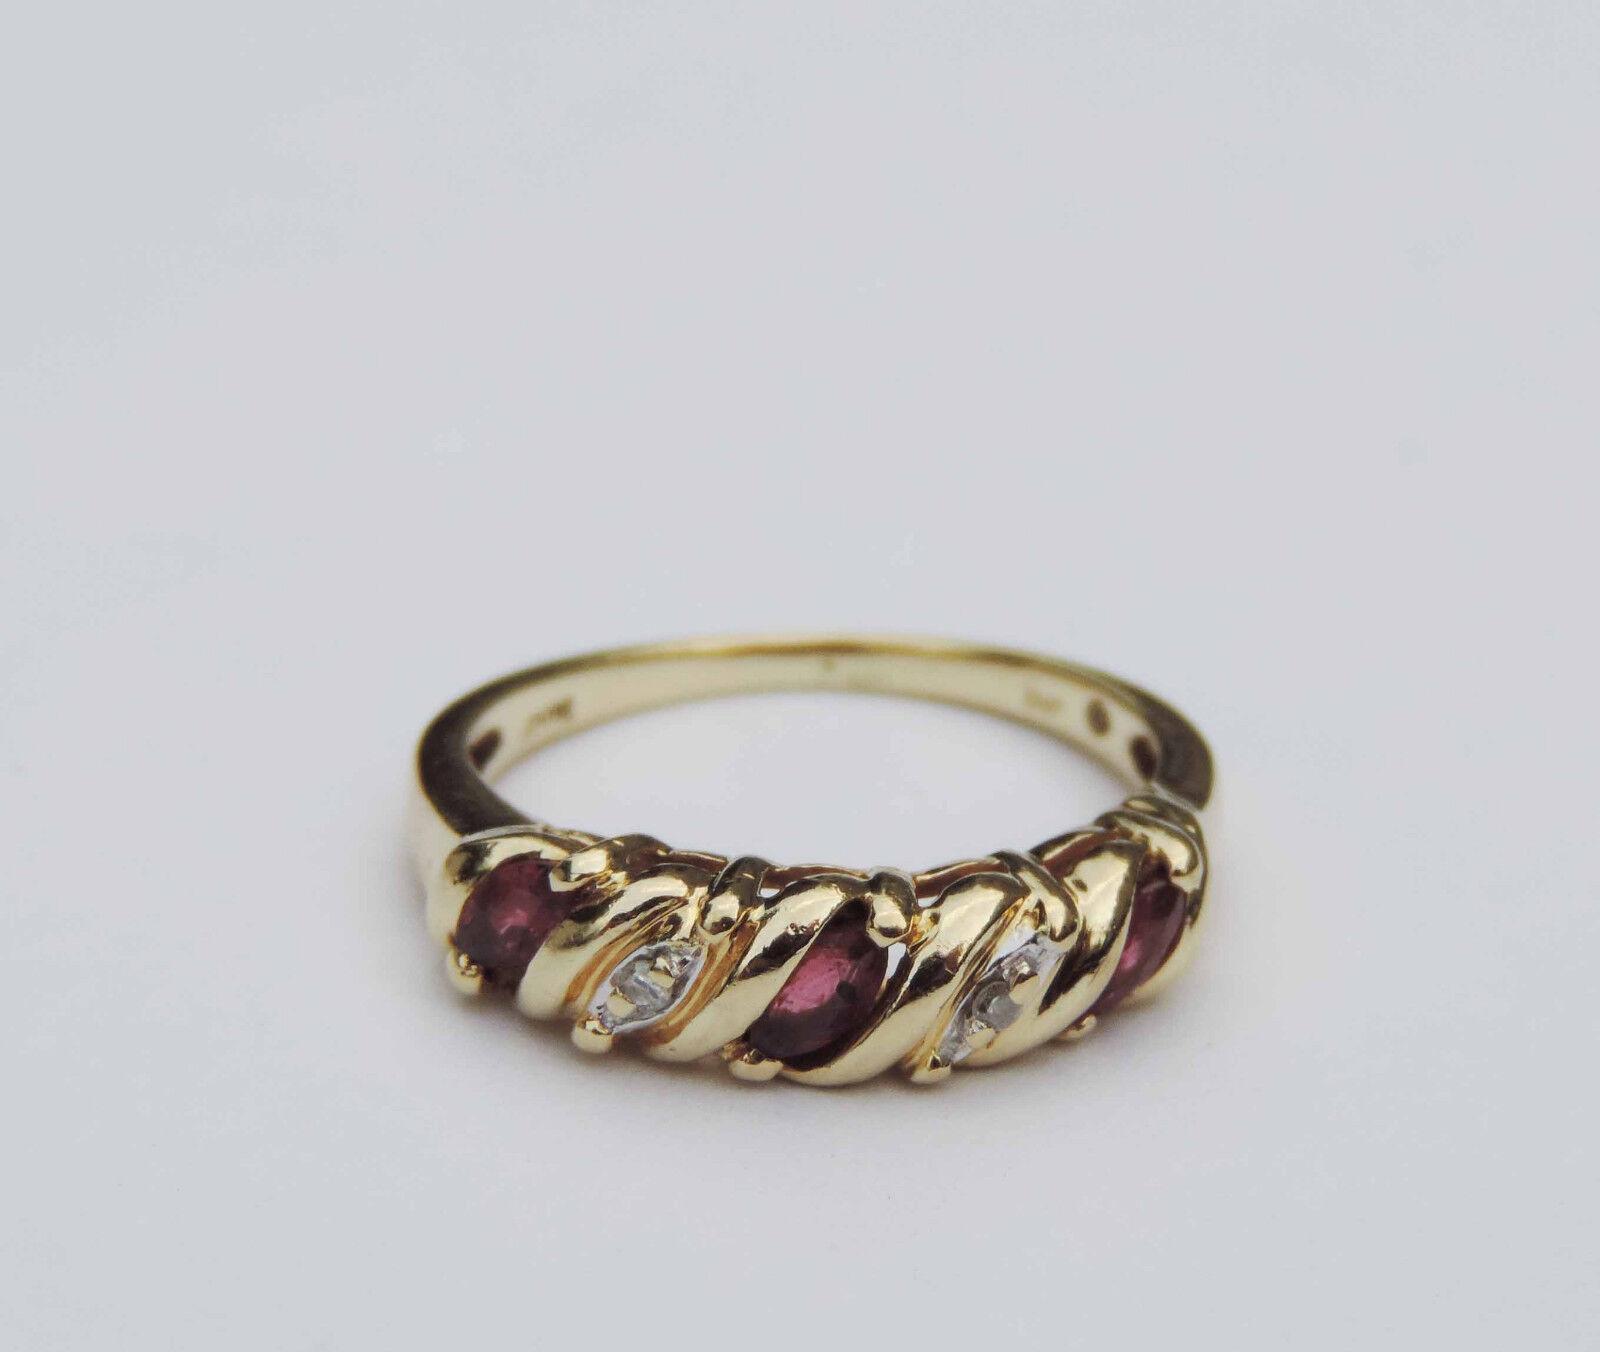 Ladies Genuine Marquise Ruby Gemstone Ring w  2 Diamonds - 10k Yellow gold